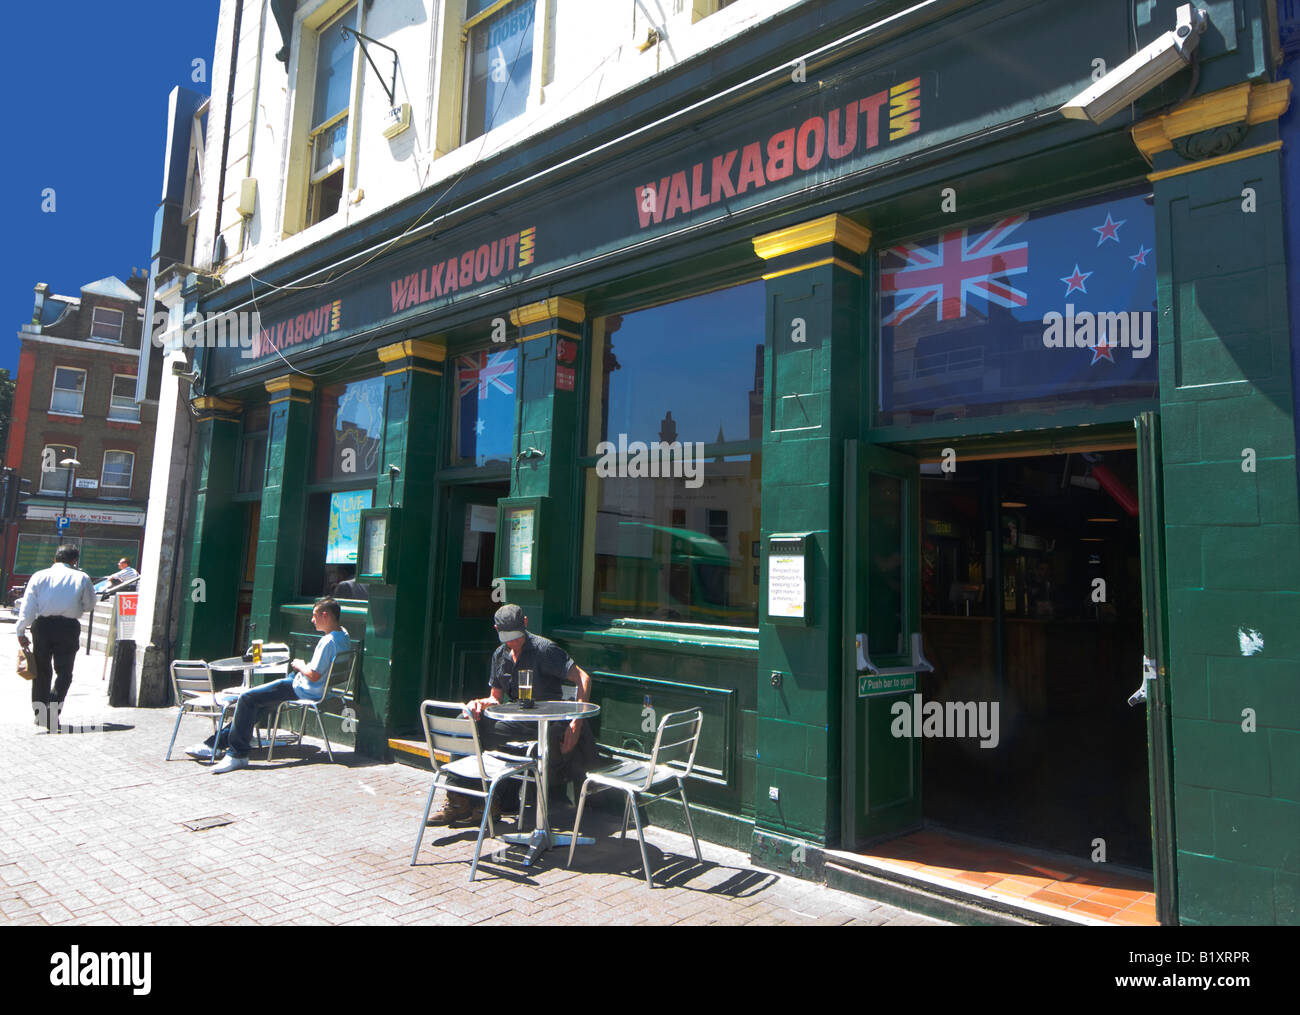 Walkabout Pub Upper Street Islington London - Stock Image